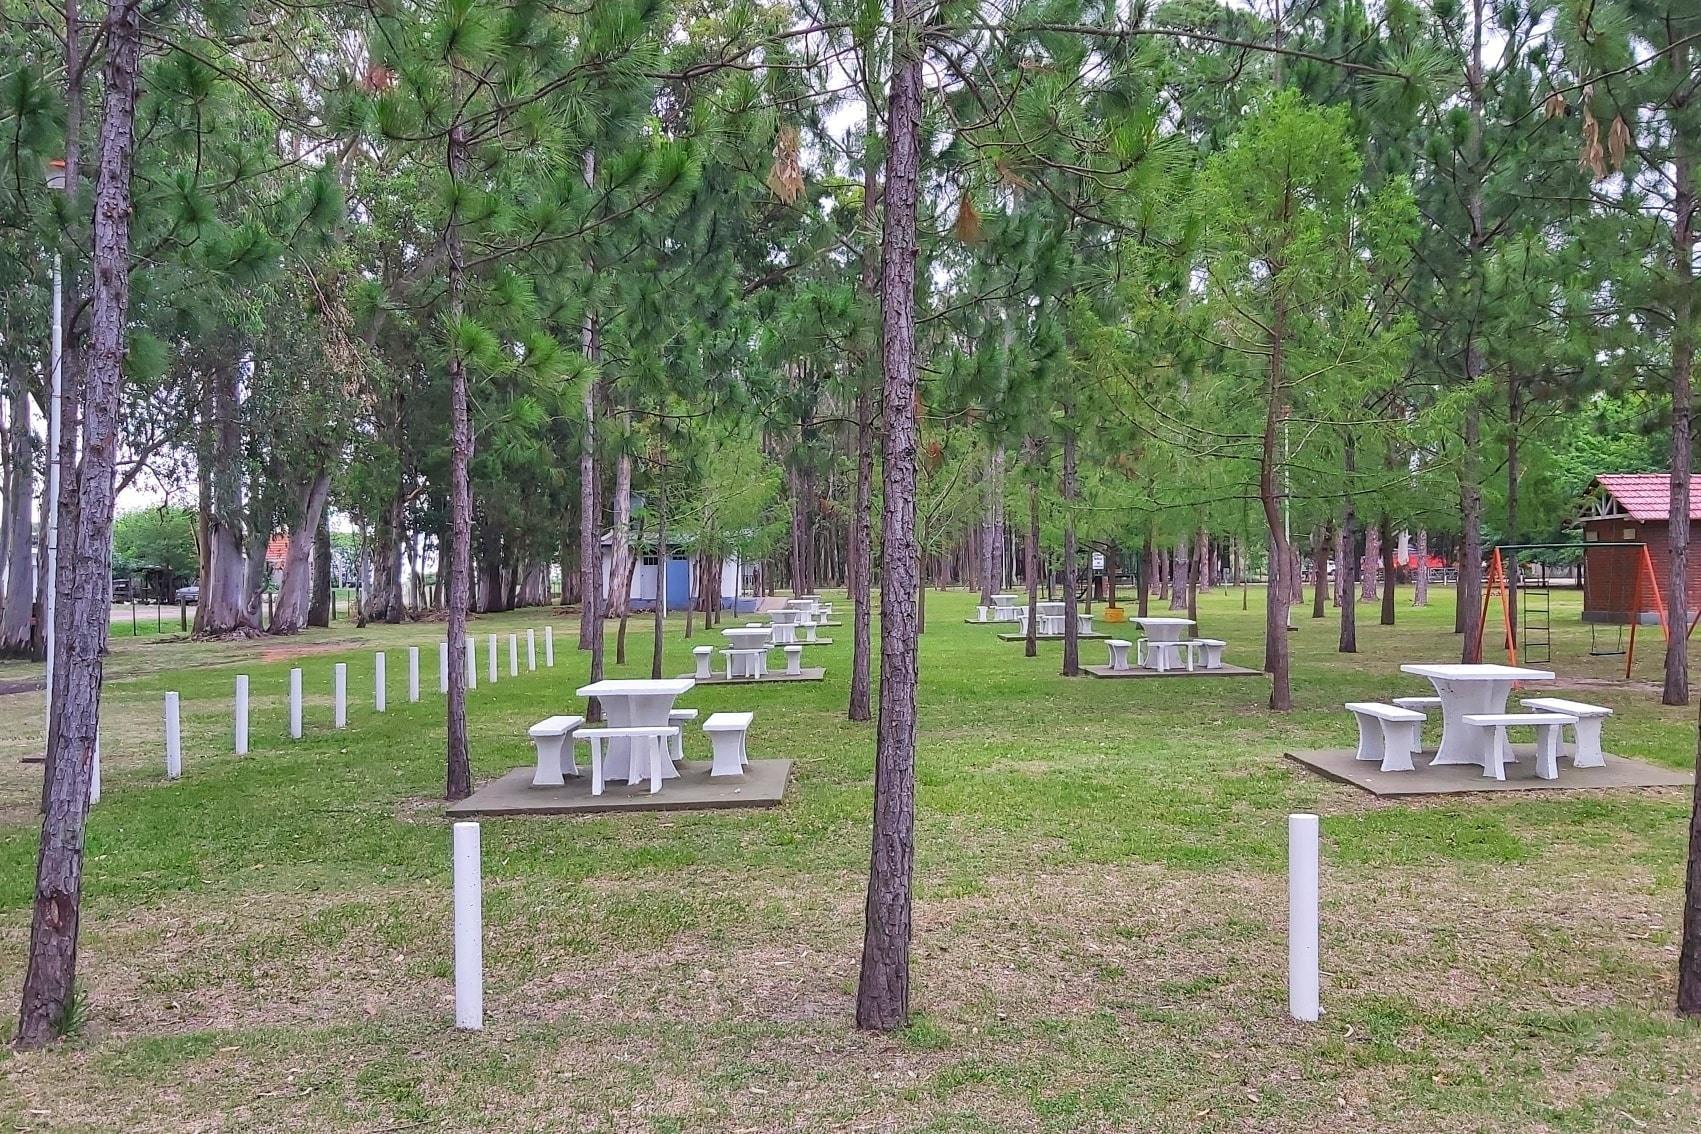 Malabrigo: Parque Los Pinos está listo para poder usarlo